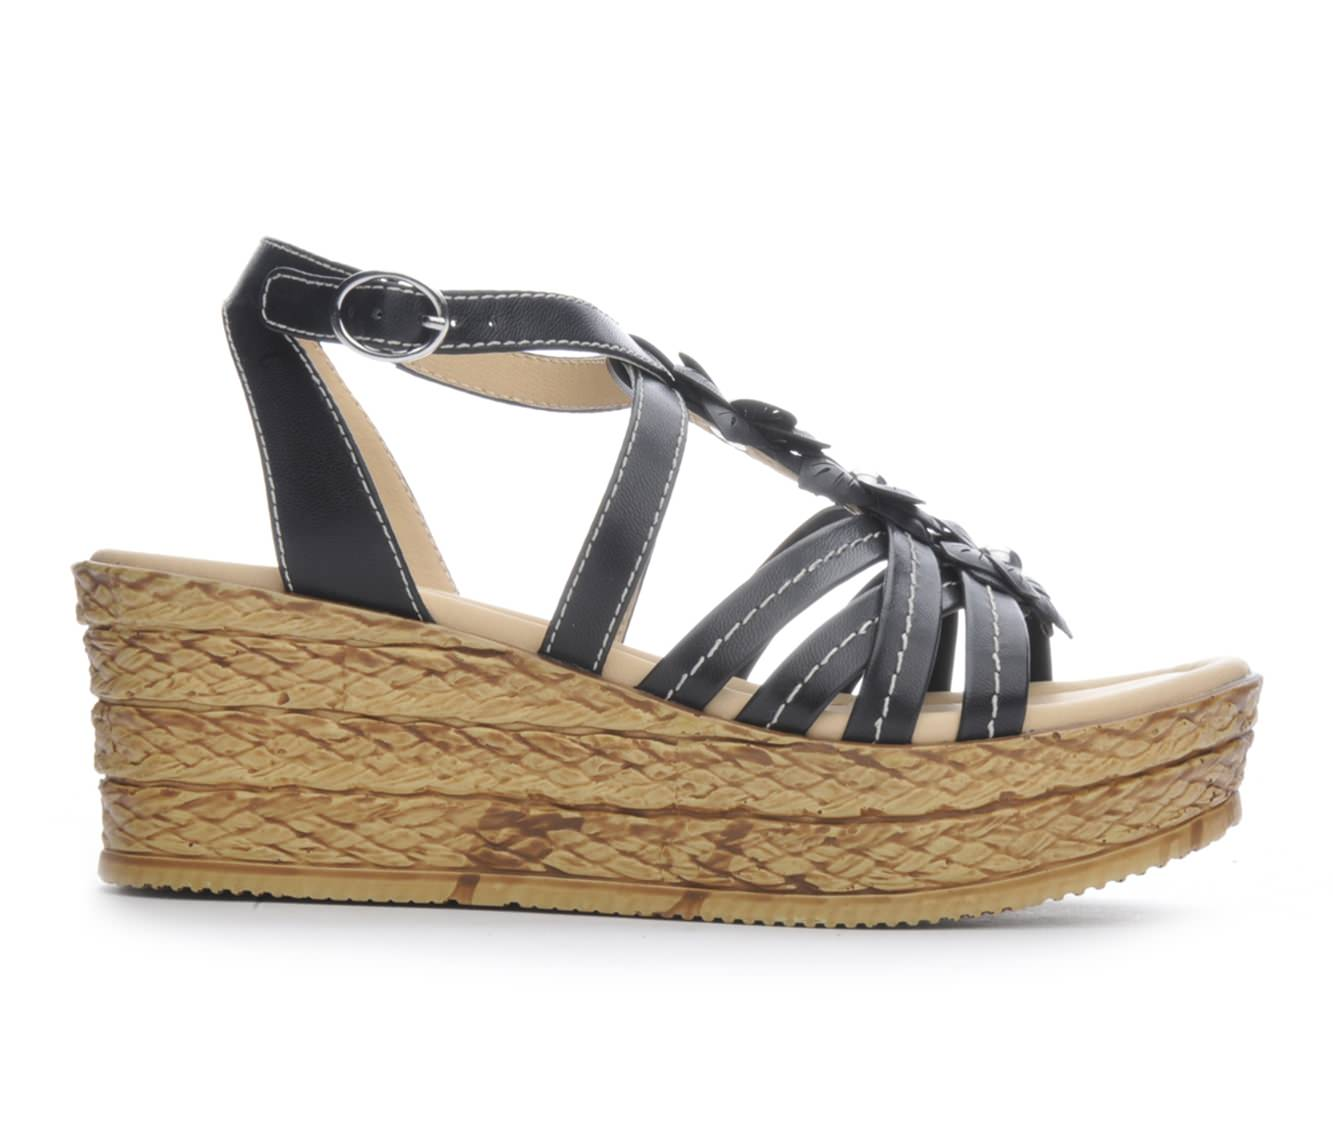 Women's BareTraps Fuchsia Sandals (Black)